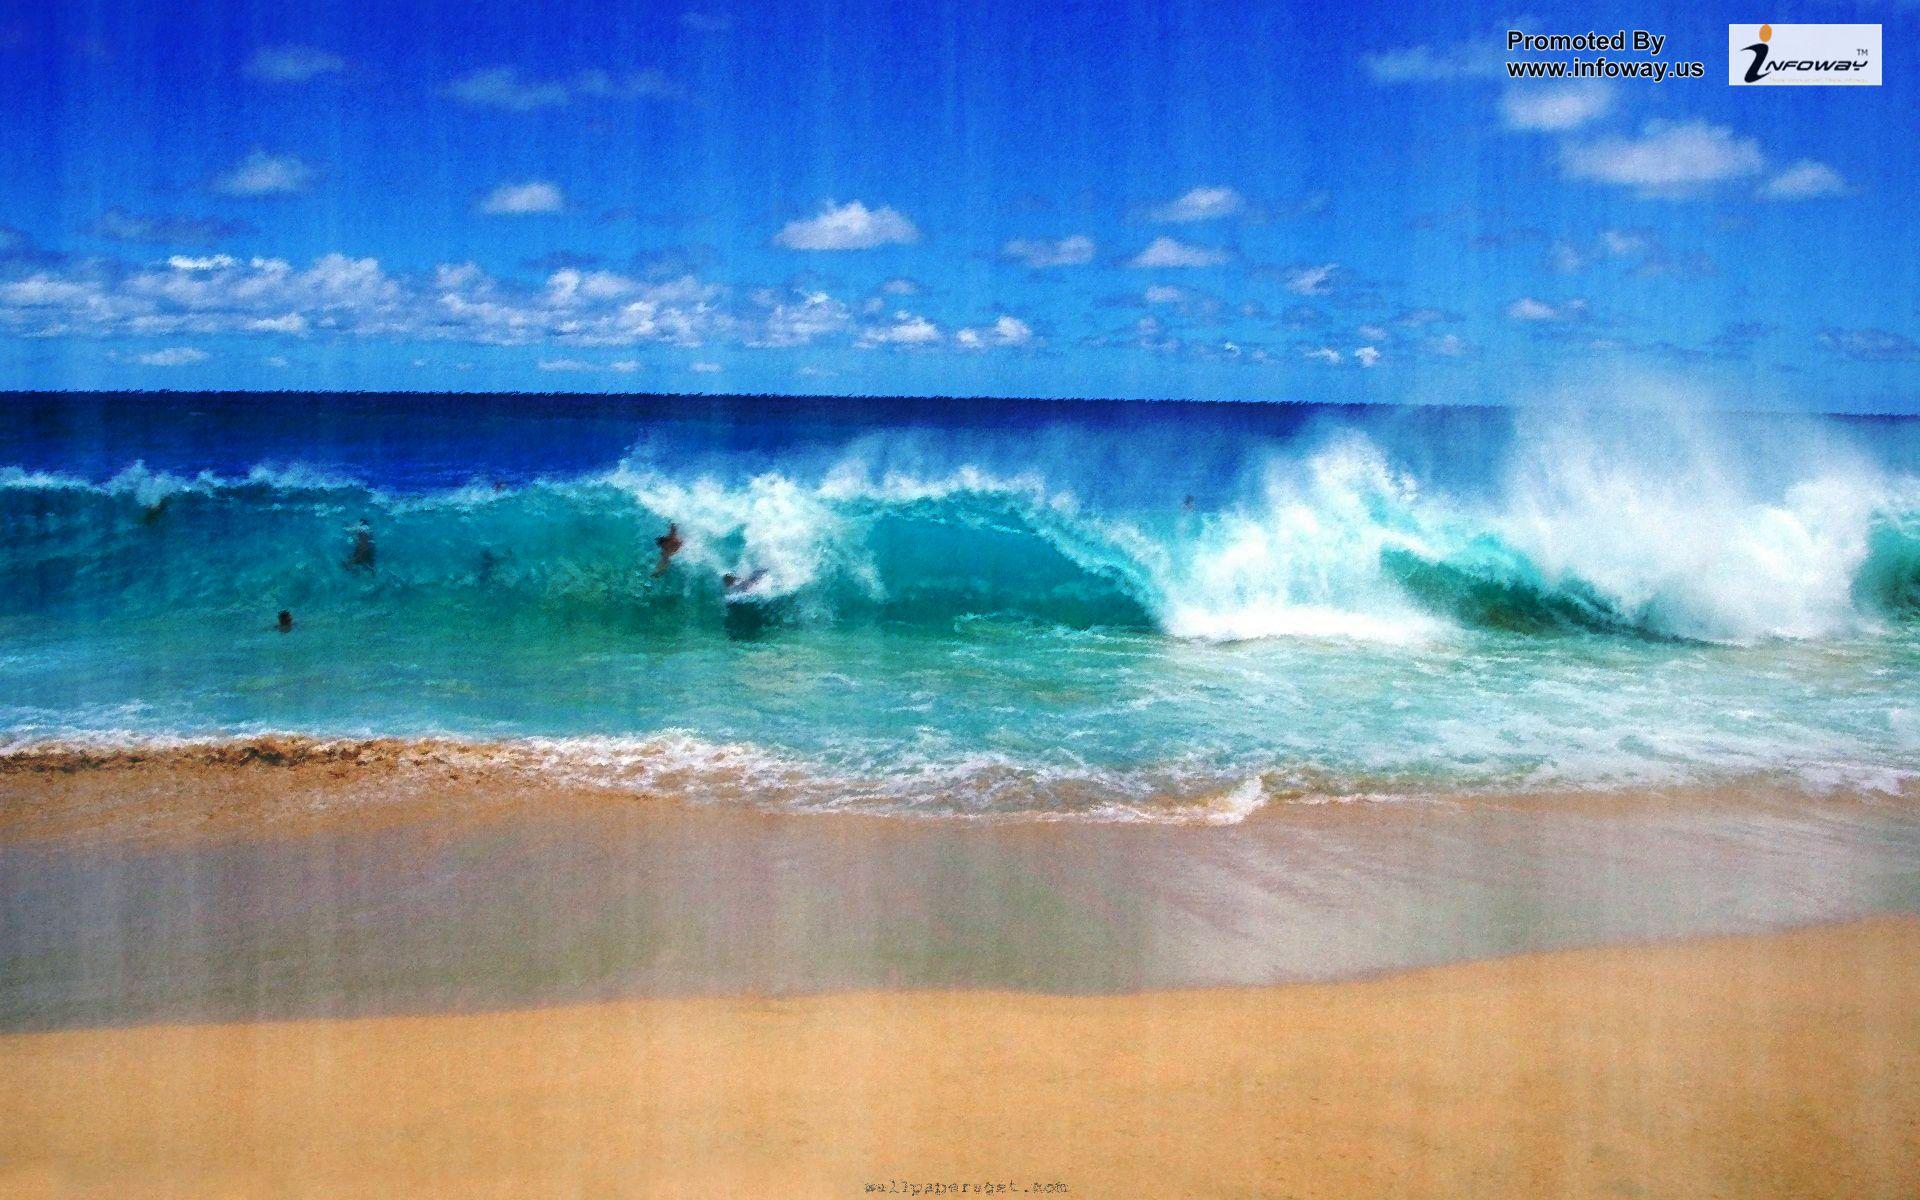 beach ocean surf swimming beautiful scenery hd wallpapers beautiful 1920x1200